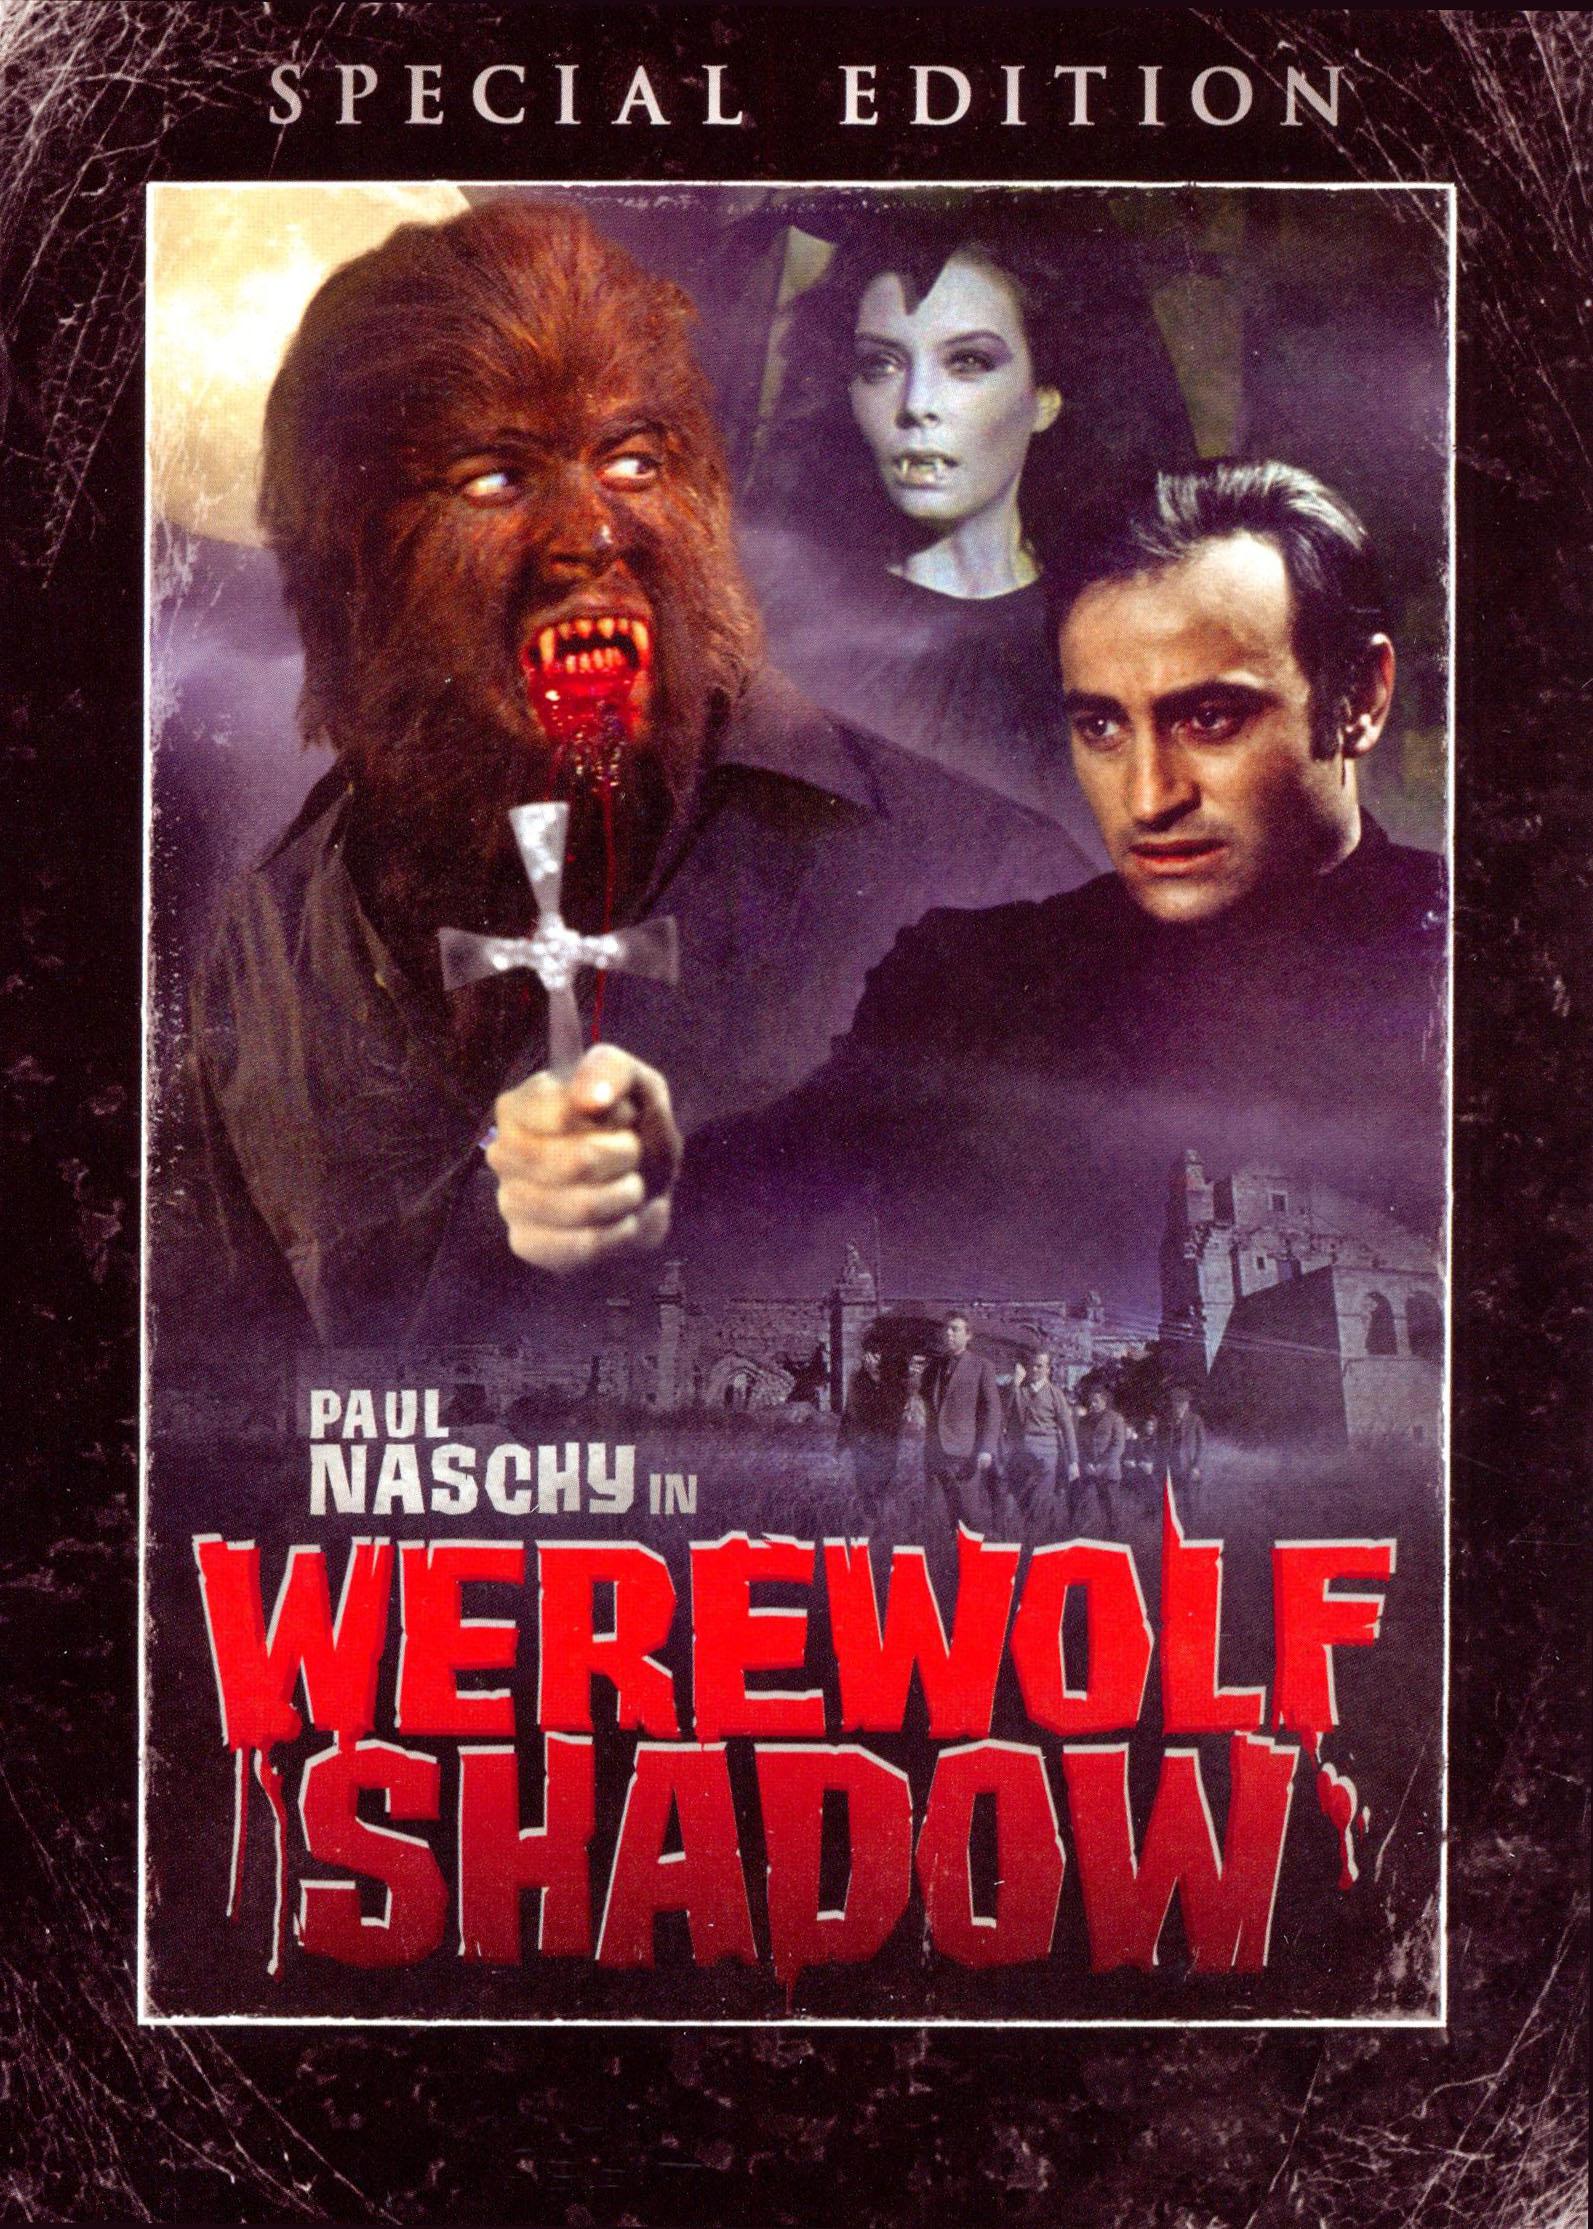 The Werewolf vs. the Vampire Woman